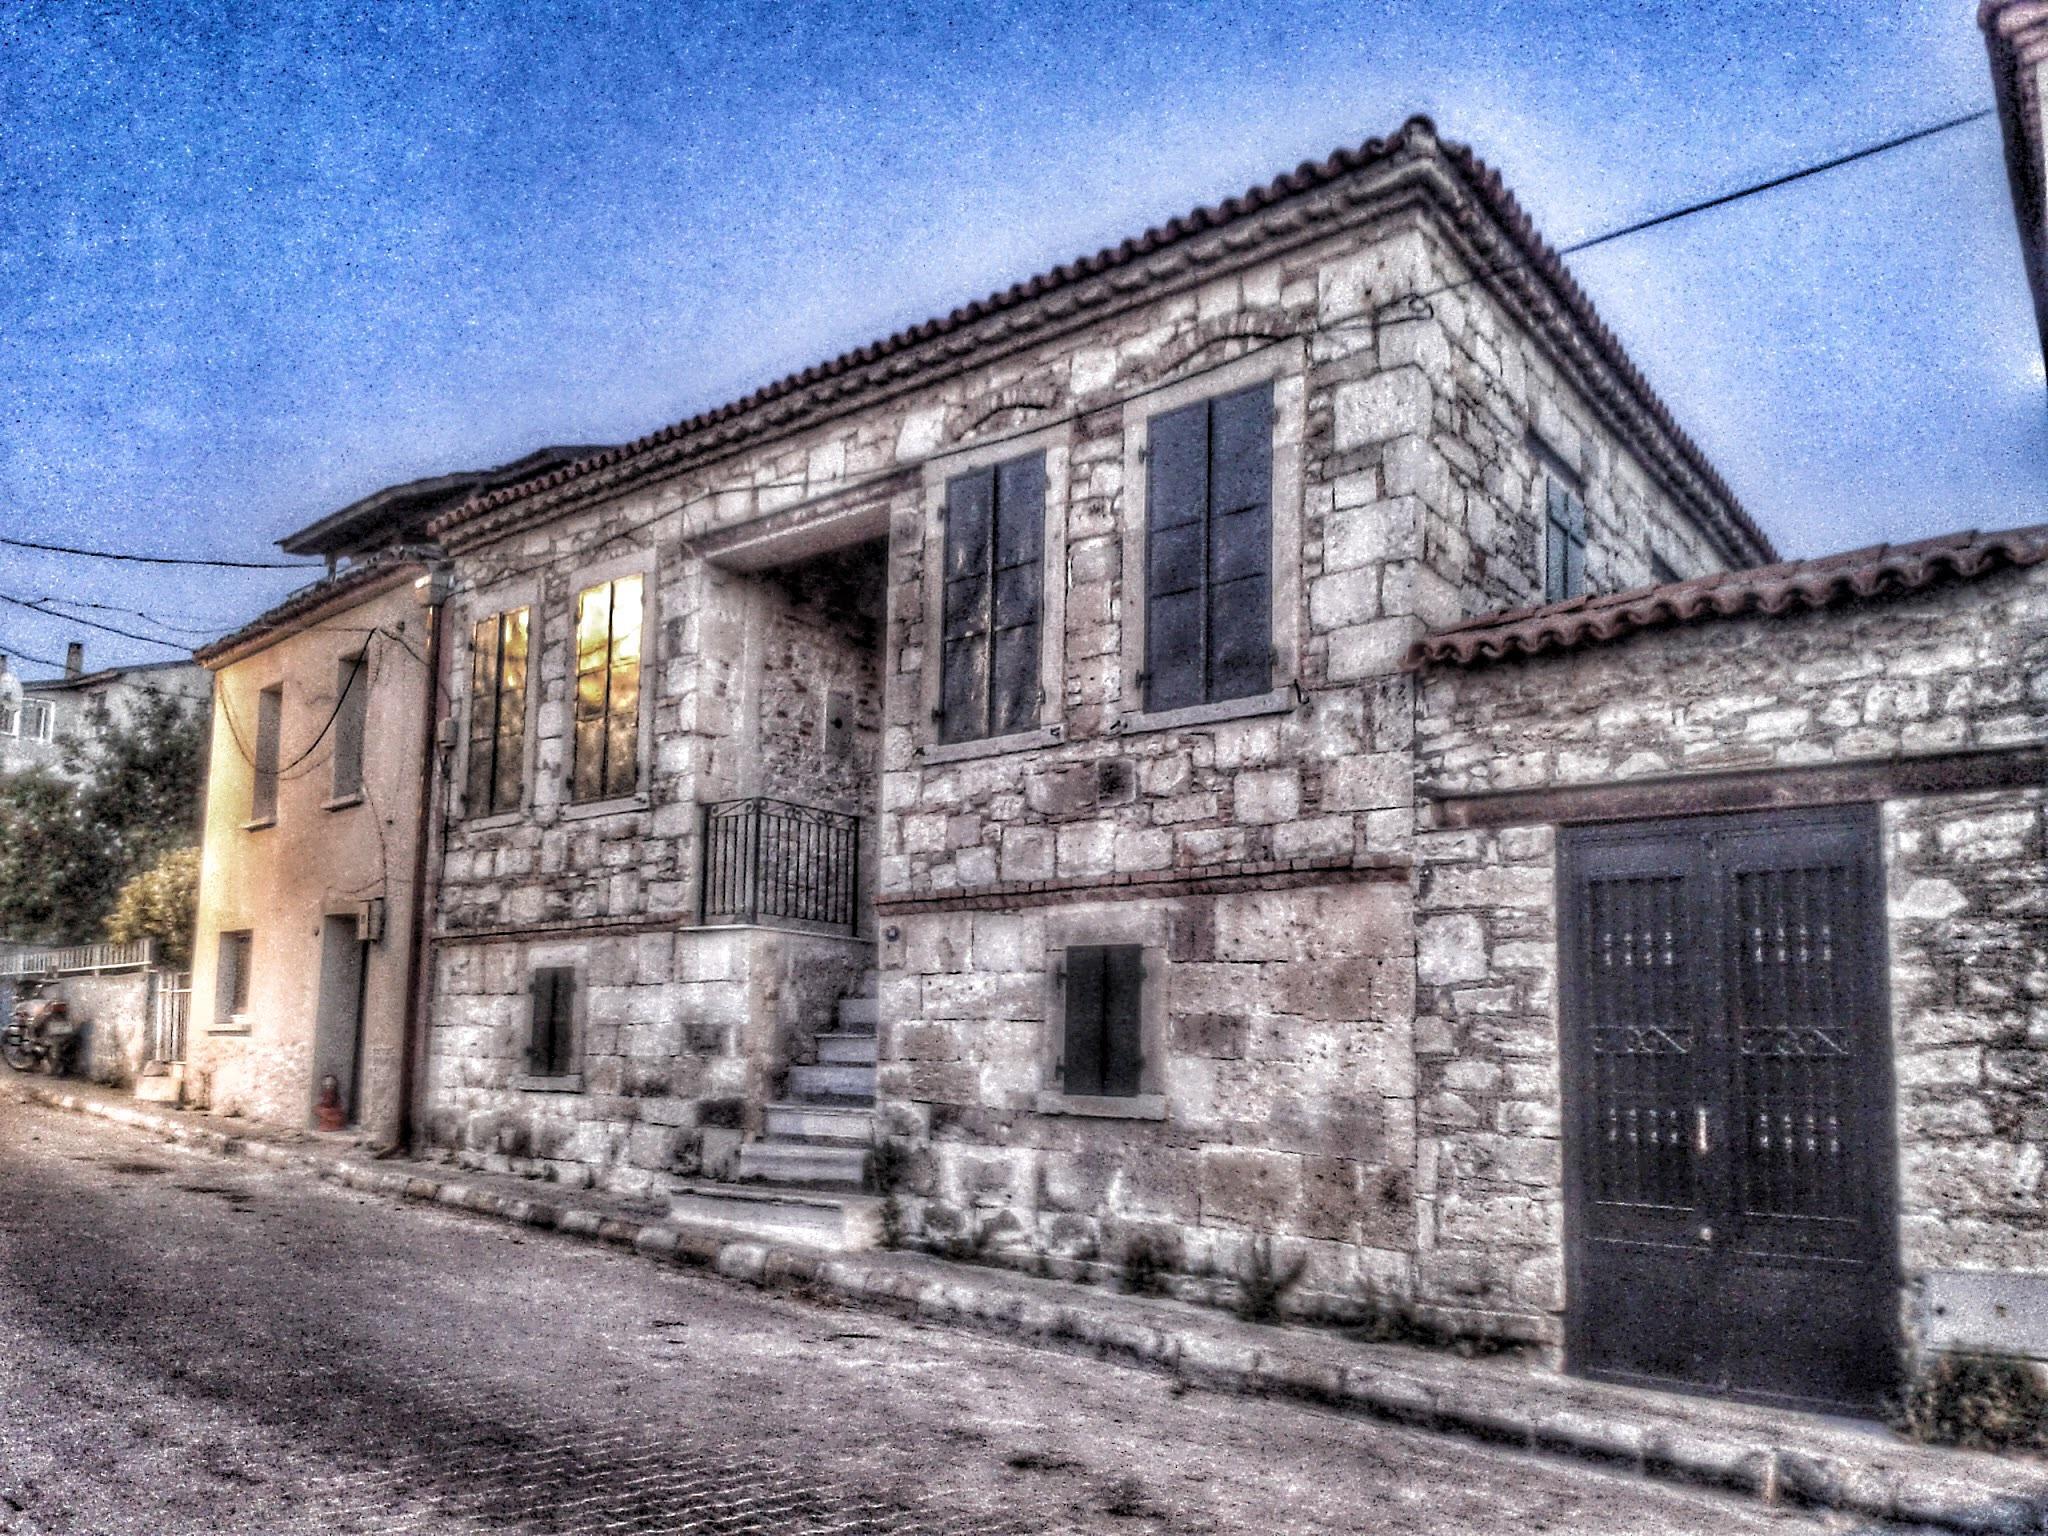 Old house in Urla by Meriç Aksu